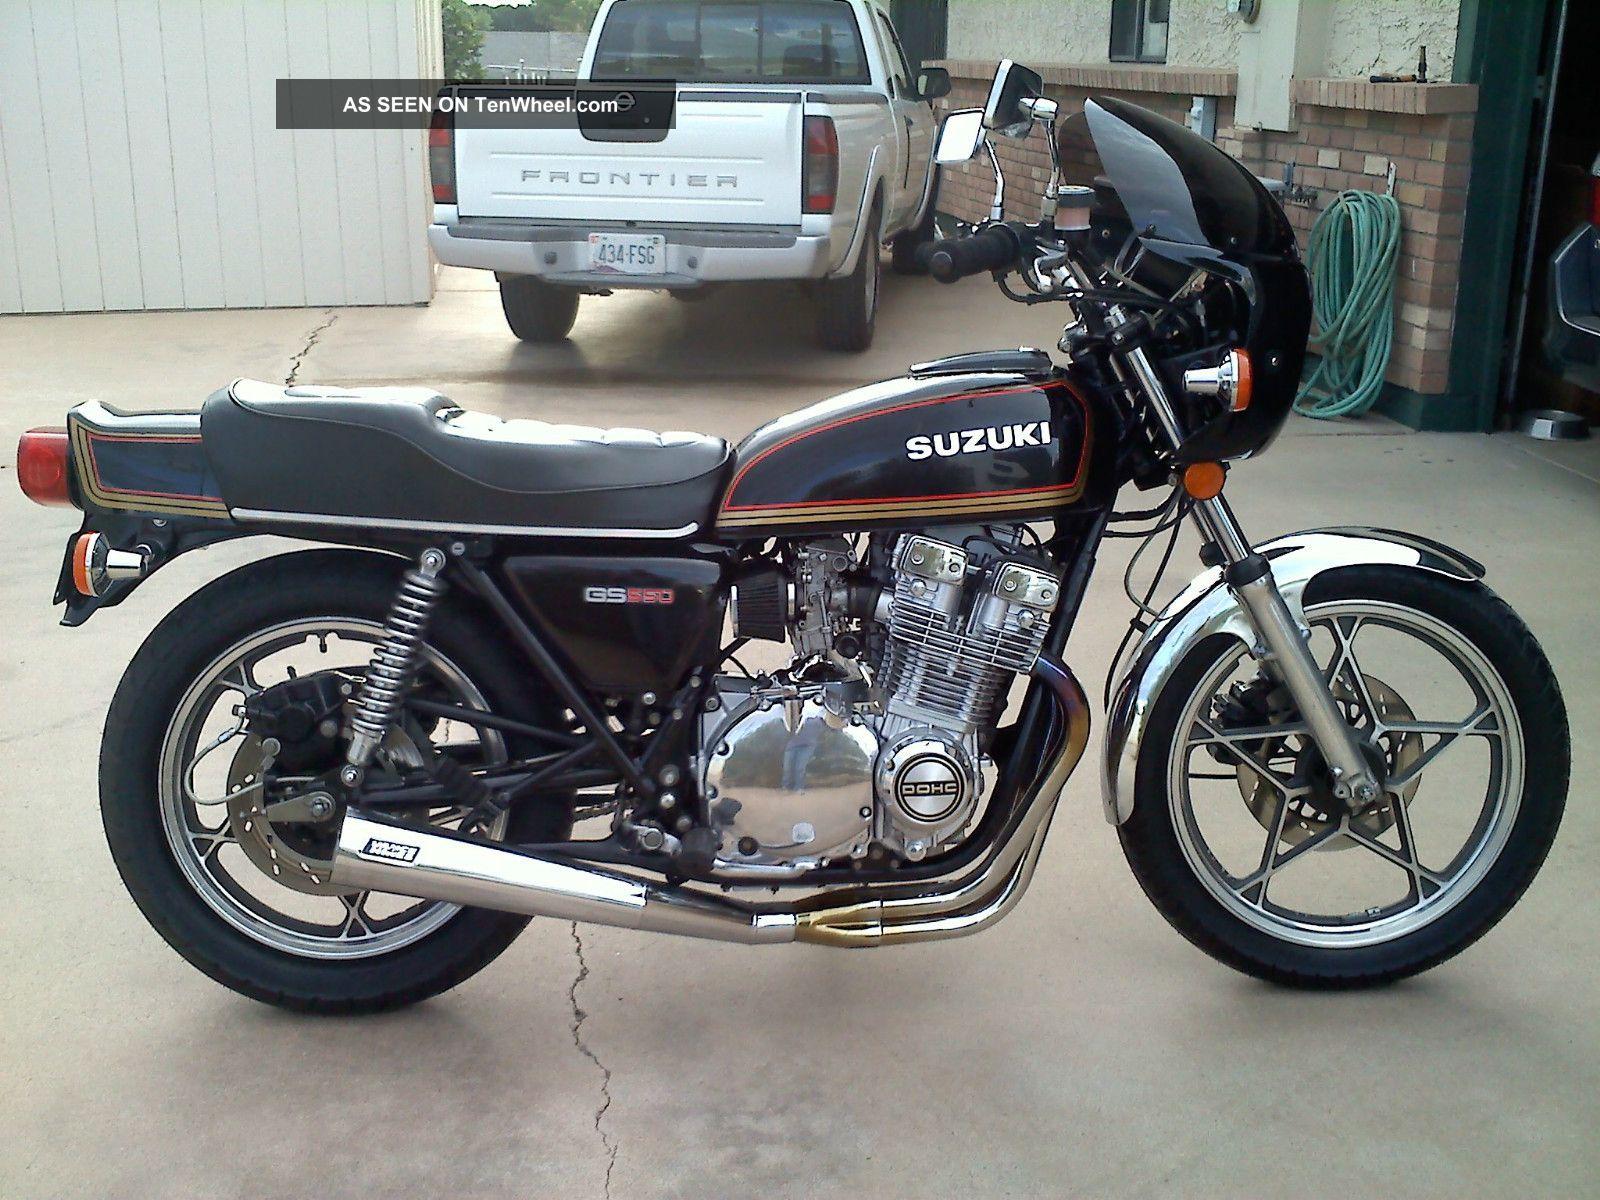 1978 Suzuki Gs550e Custom 750 Engine GS photo